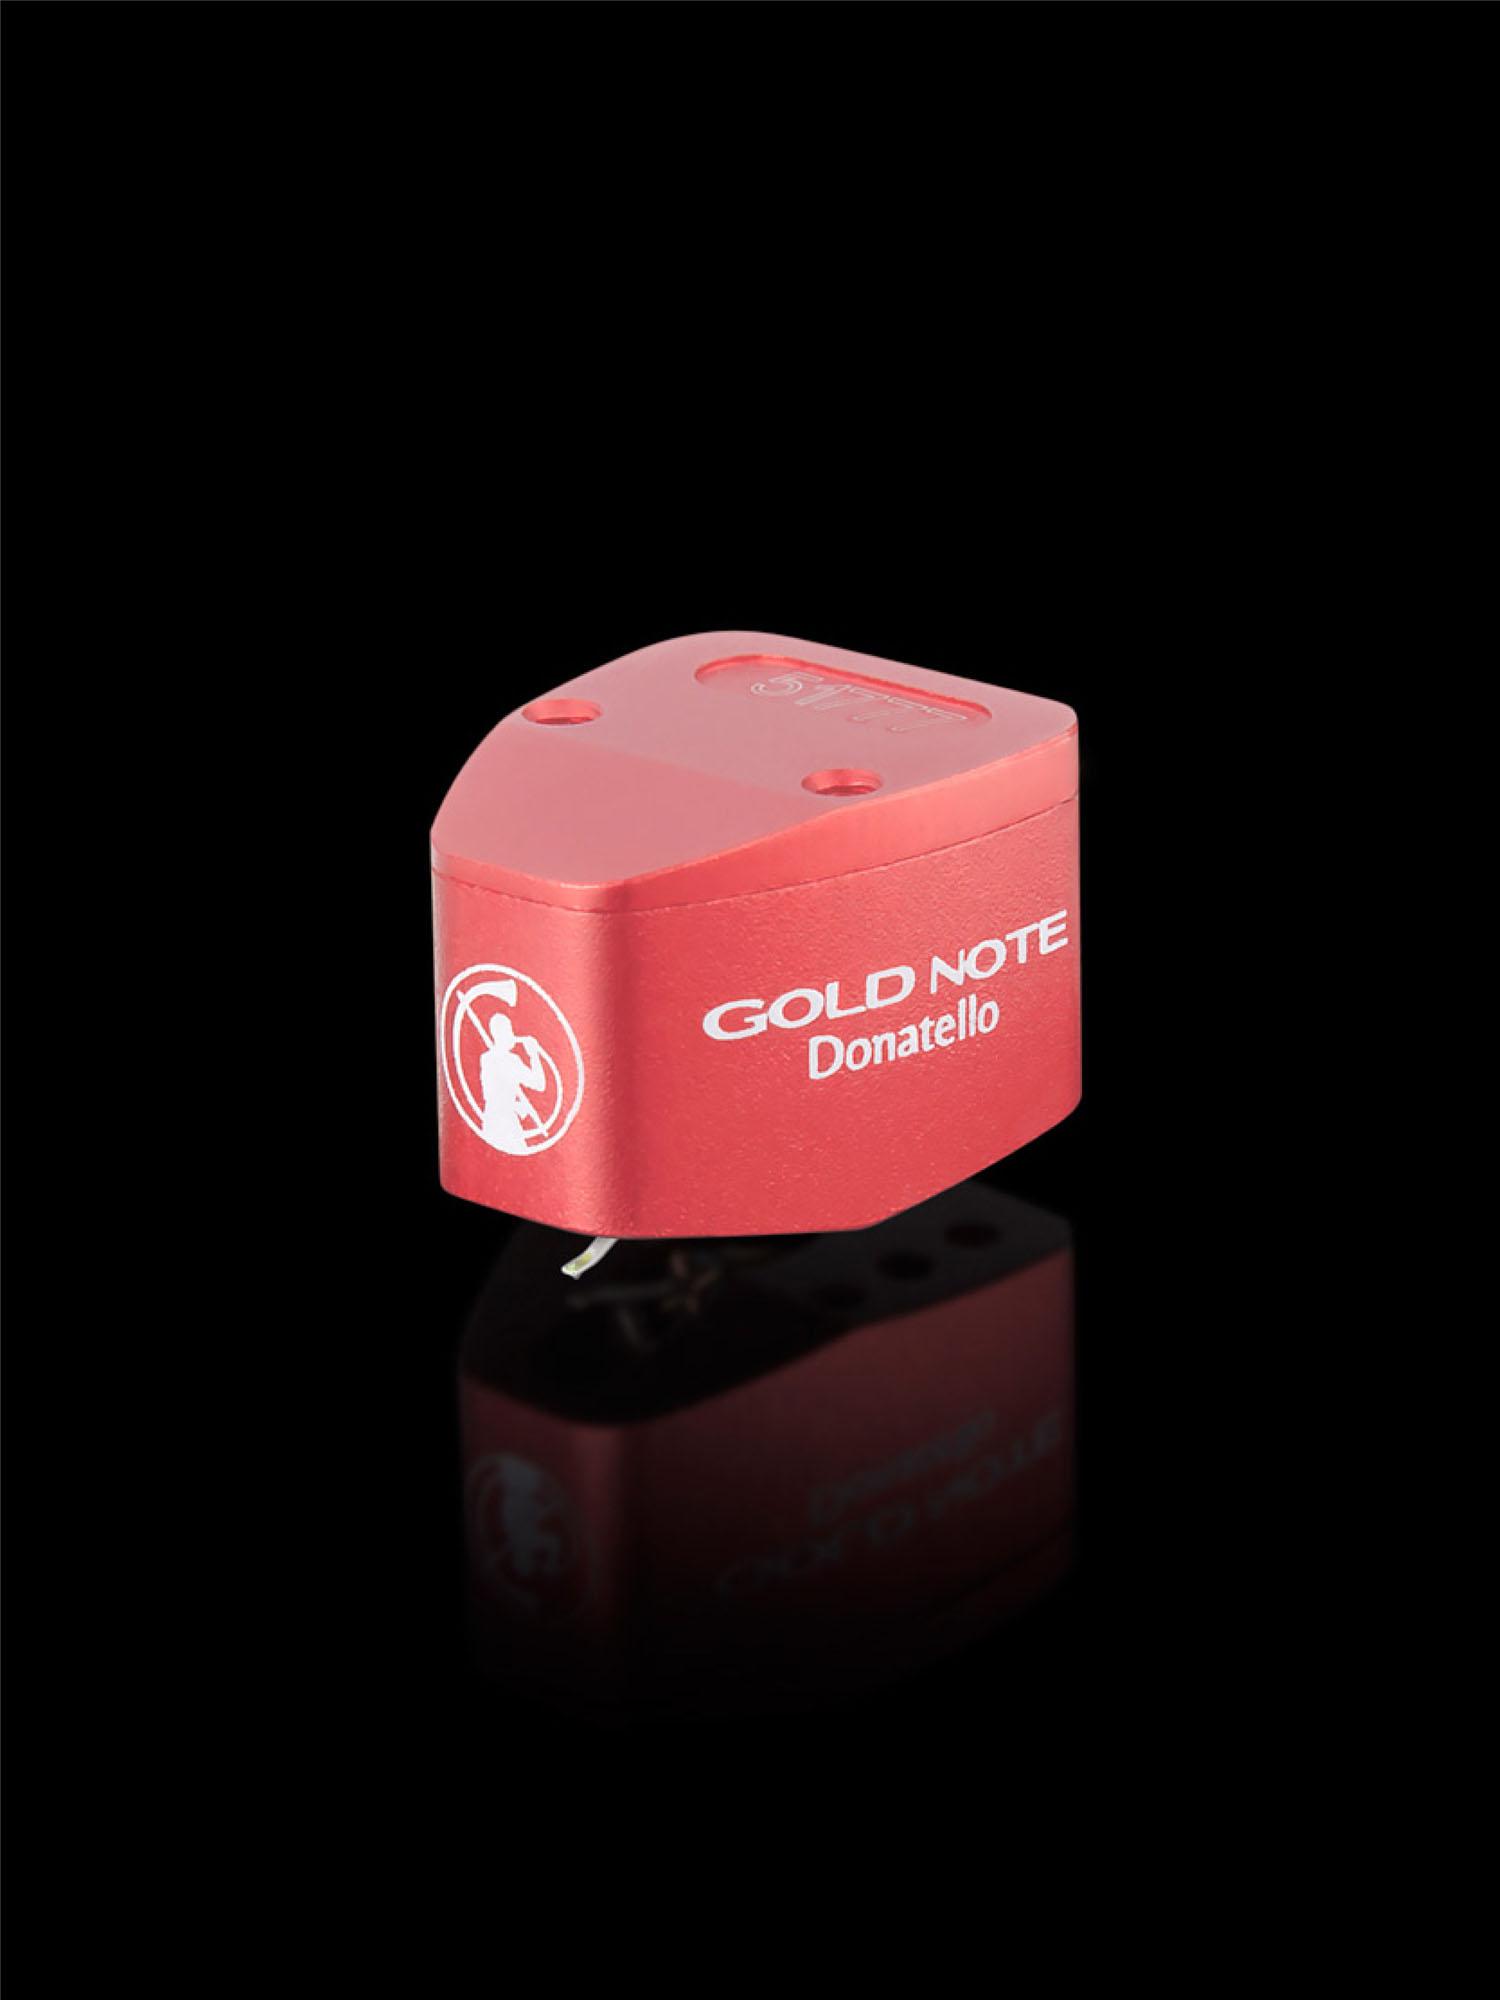 Gold Note Donatello Red Cartridge